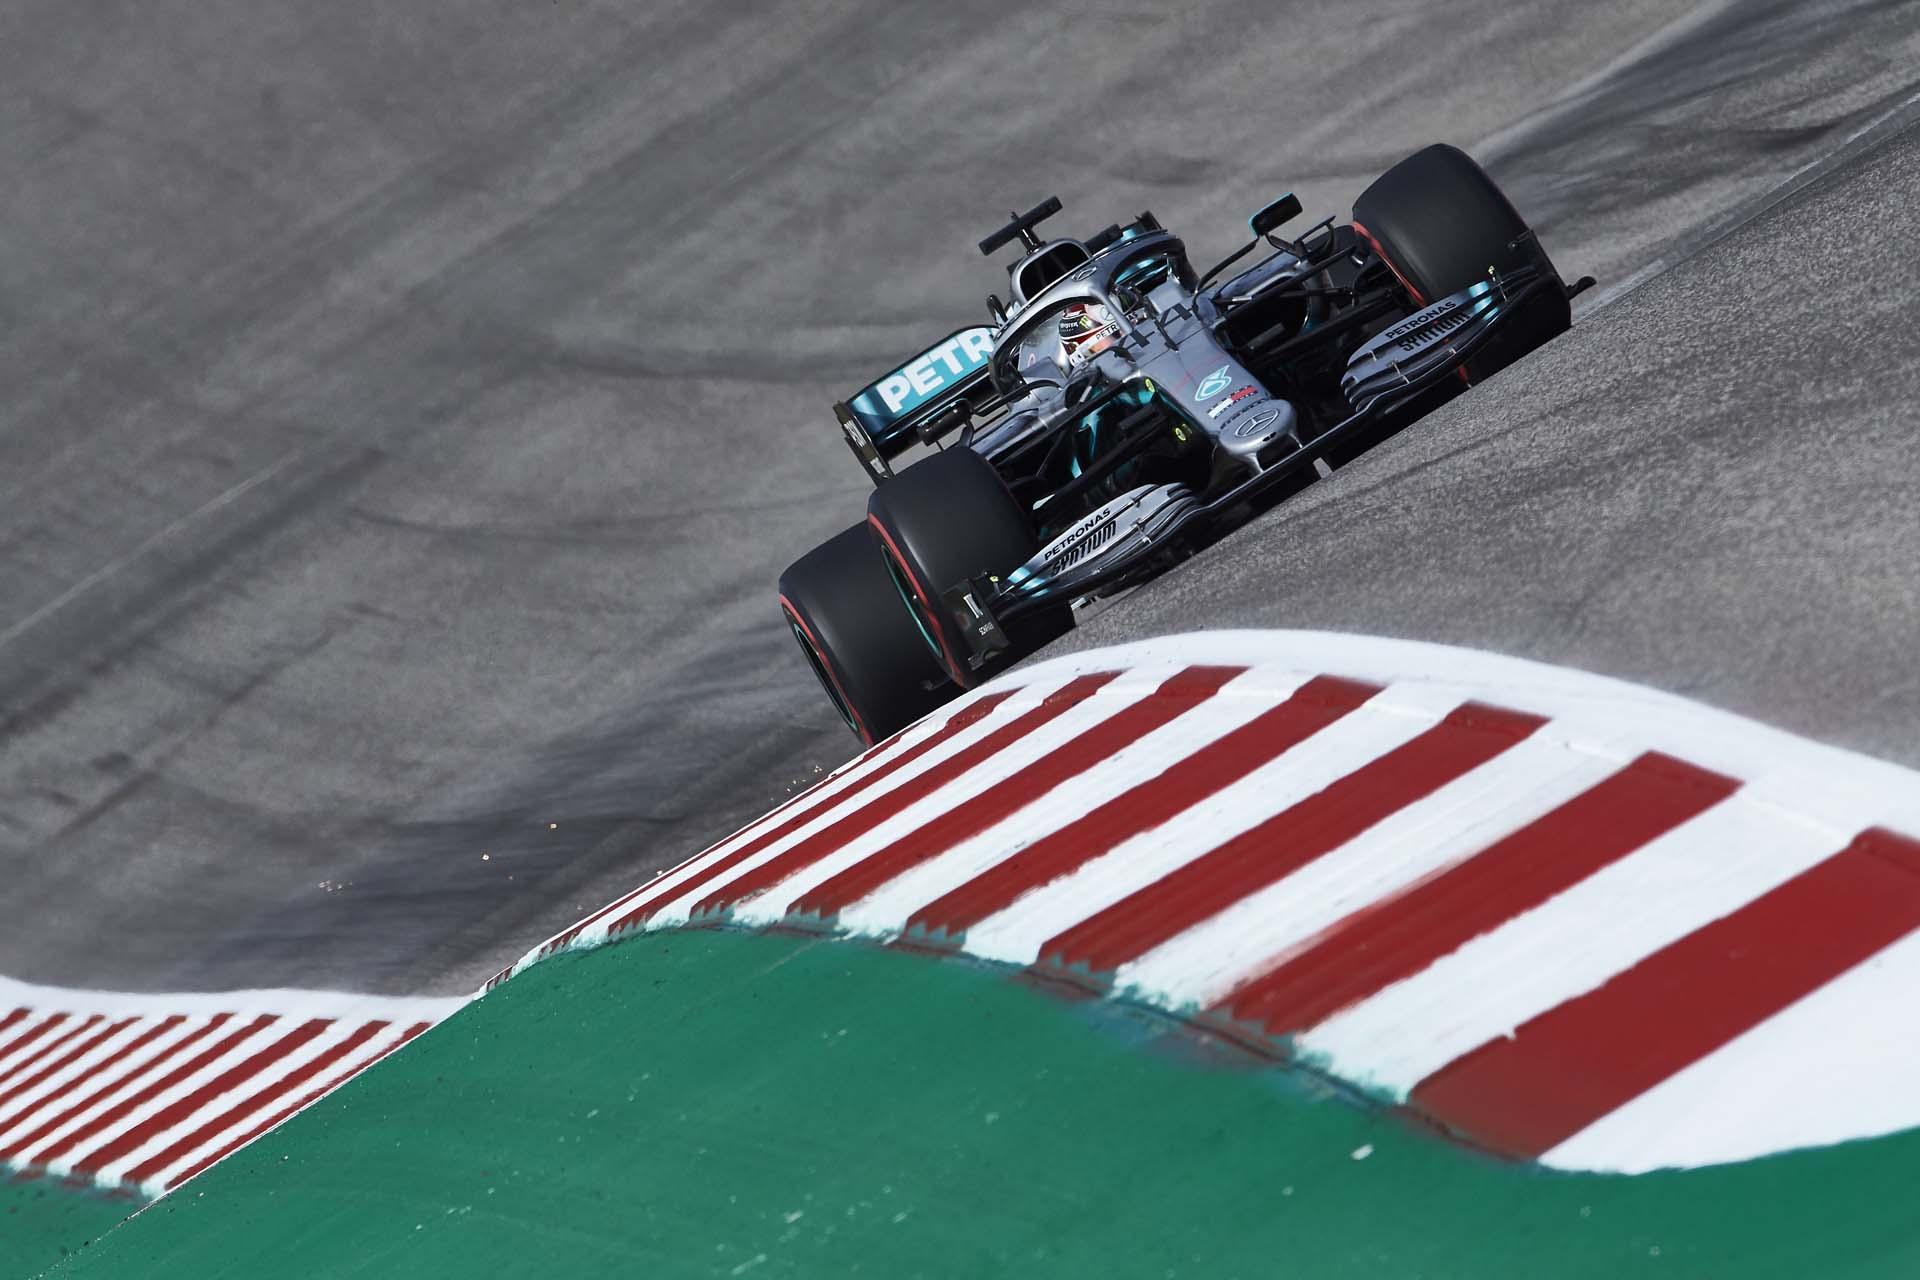 2019 United States Grand Prix, Saturday - Steve Etherington